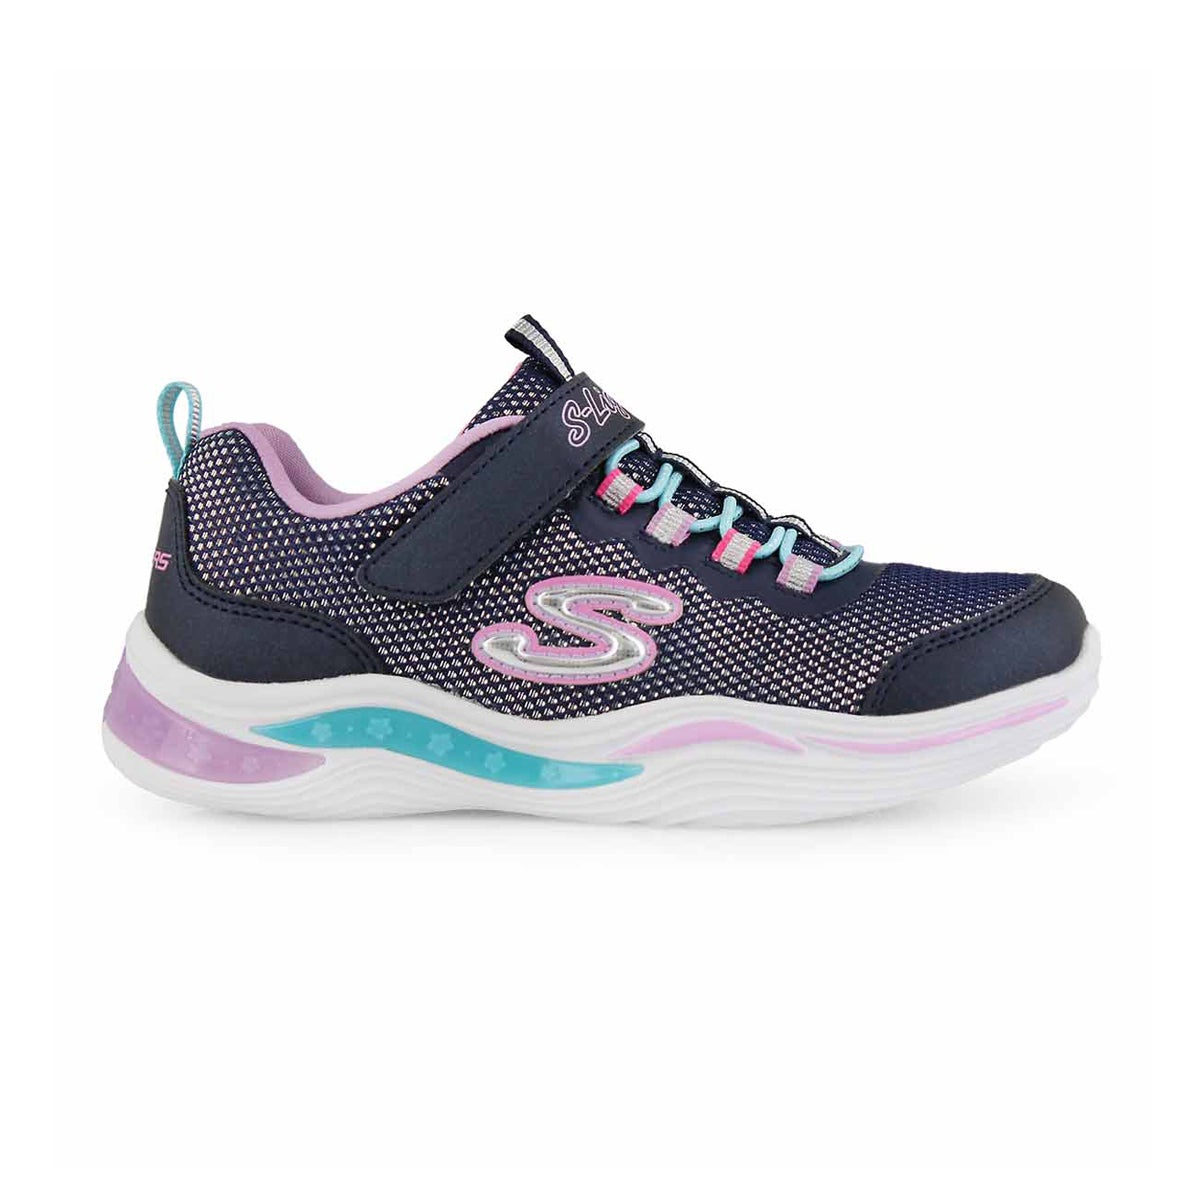 Grls Power Petals nvy/mlti sneaker